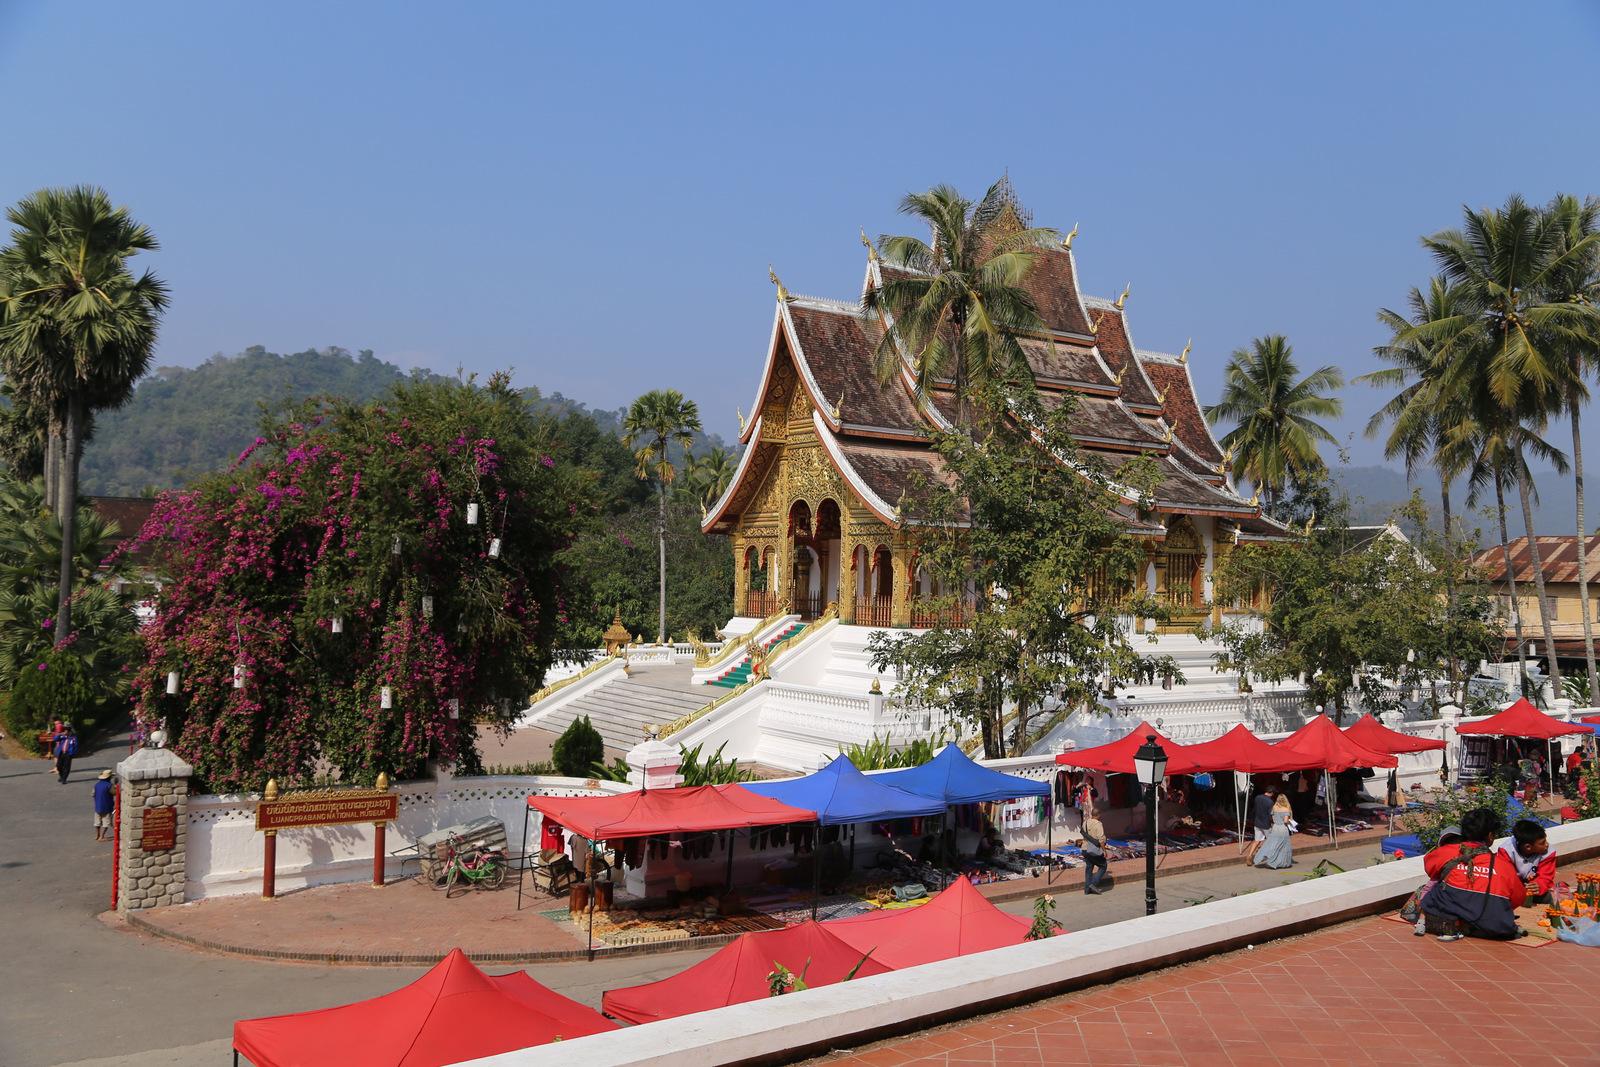 Luang Prabang - Haw Kham. Royal Palace Museum